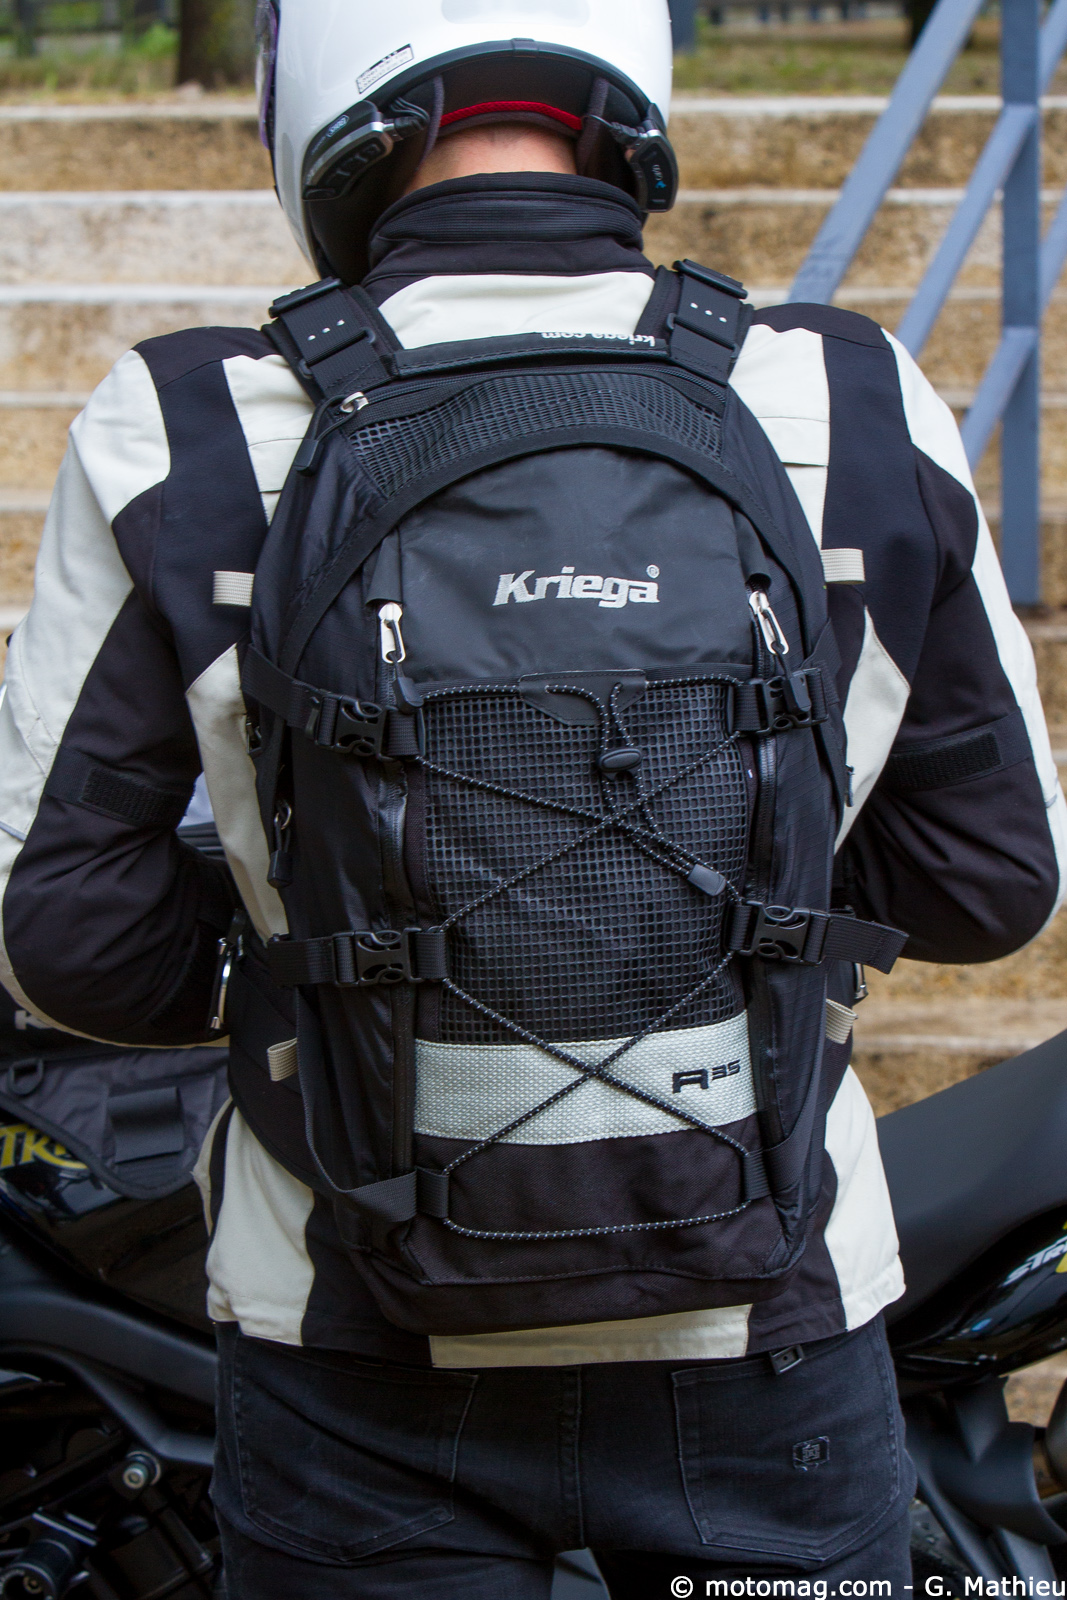 sac dos tanche pour usage moto kriega r 35 moto. Black Bedroom Furniture Sets. Home Design Ideas